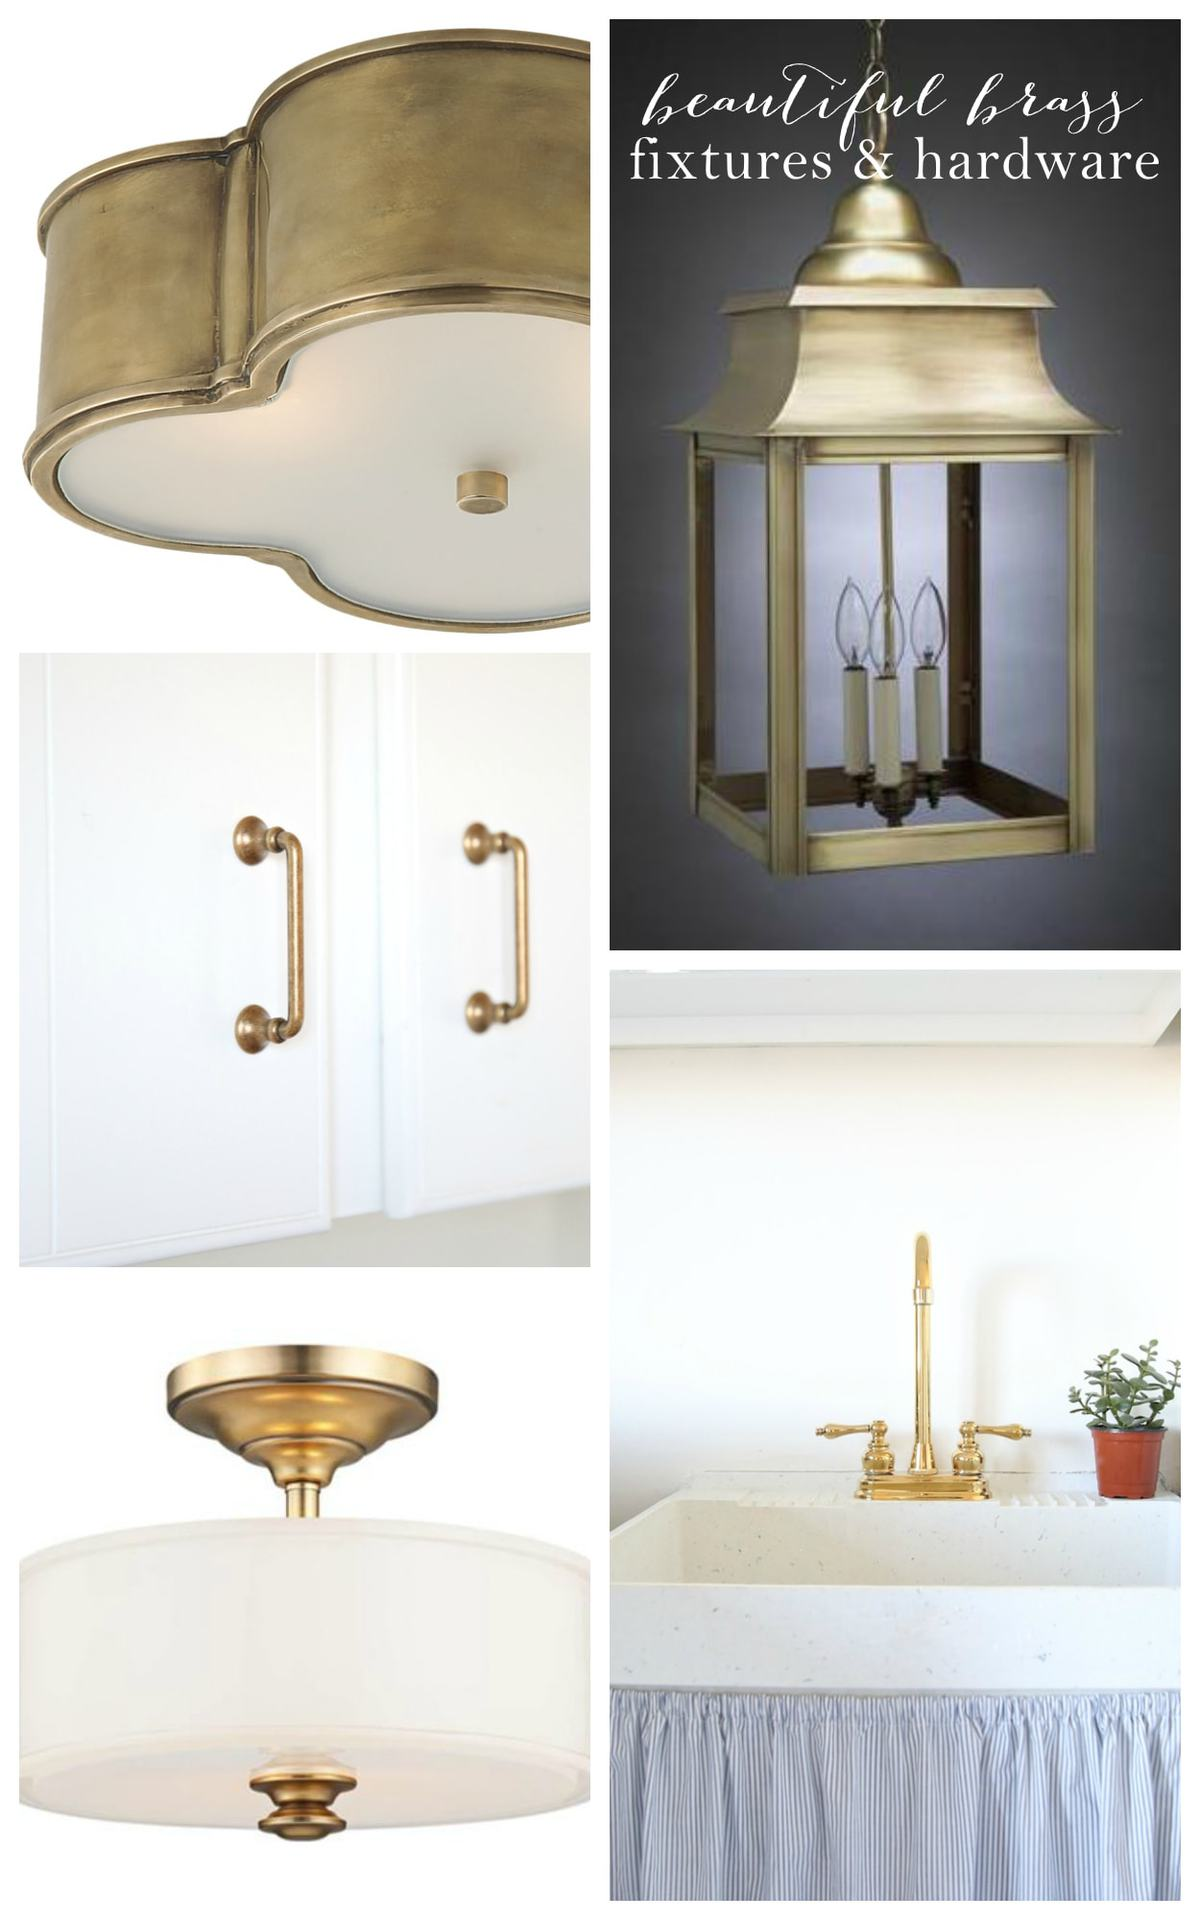 Beautiful brass hardware & light fixtures